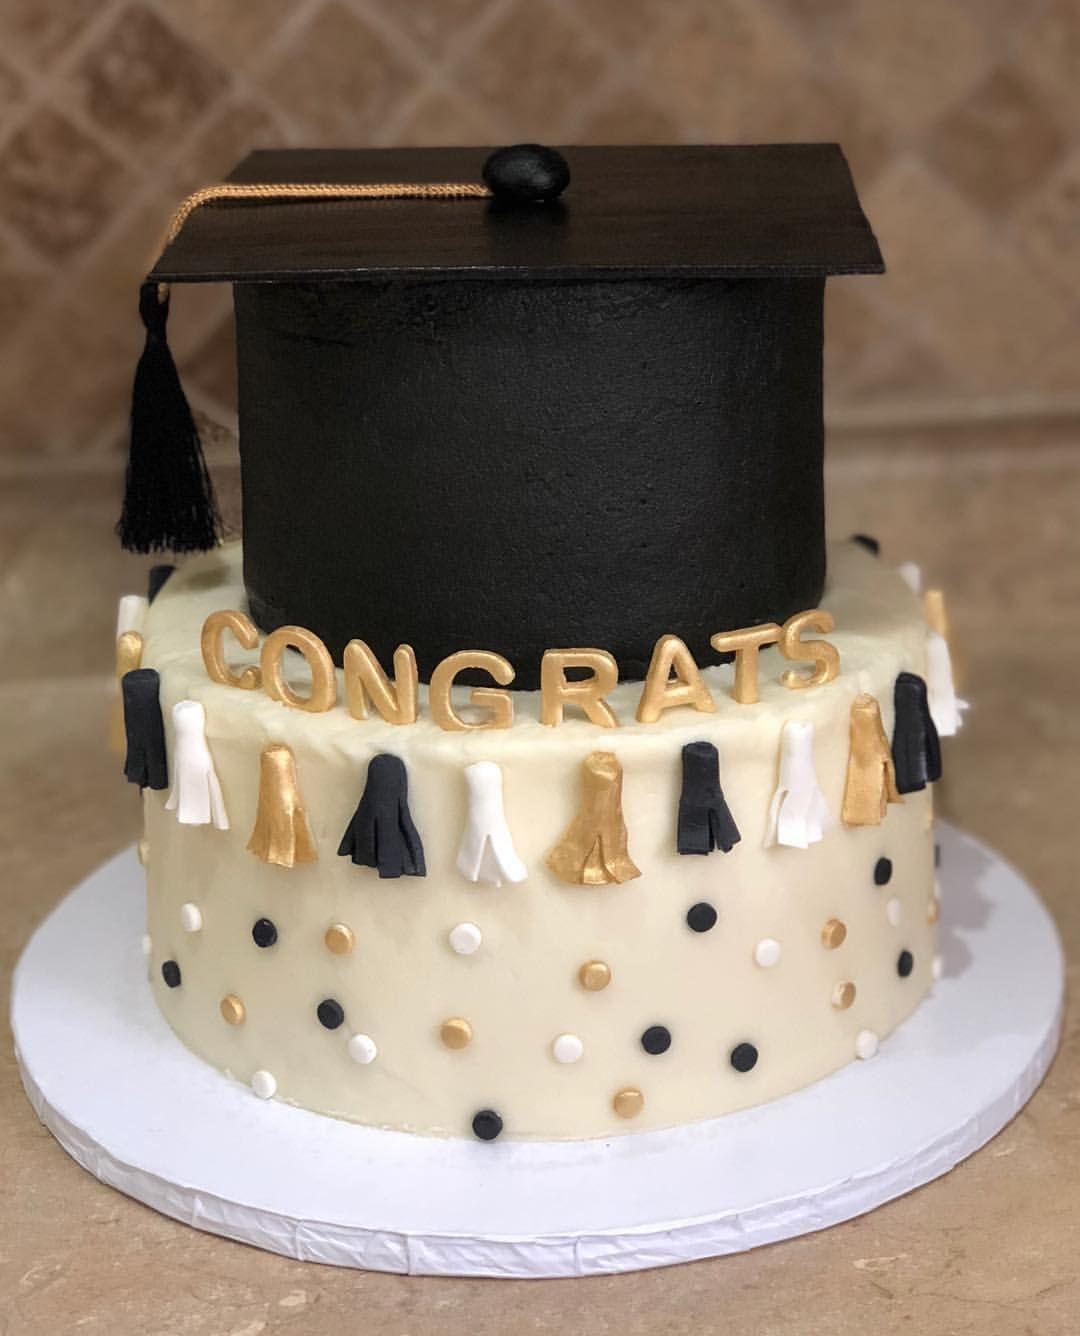 Superb Grad Cake Congratulations Red Velvet And Birthday Cake With Cream Personalised Birthday Cards Akebfashionlily Jamesorg